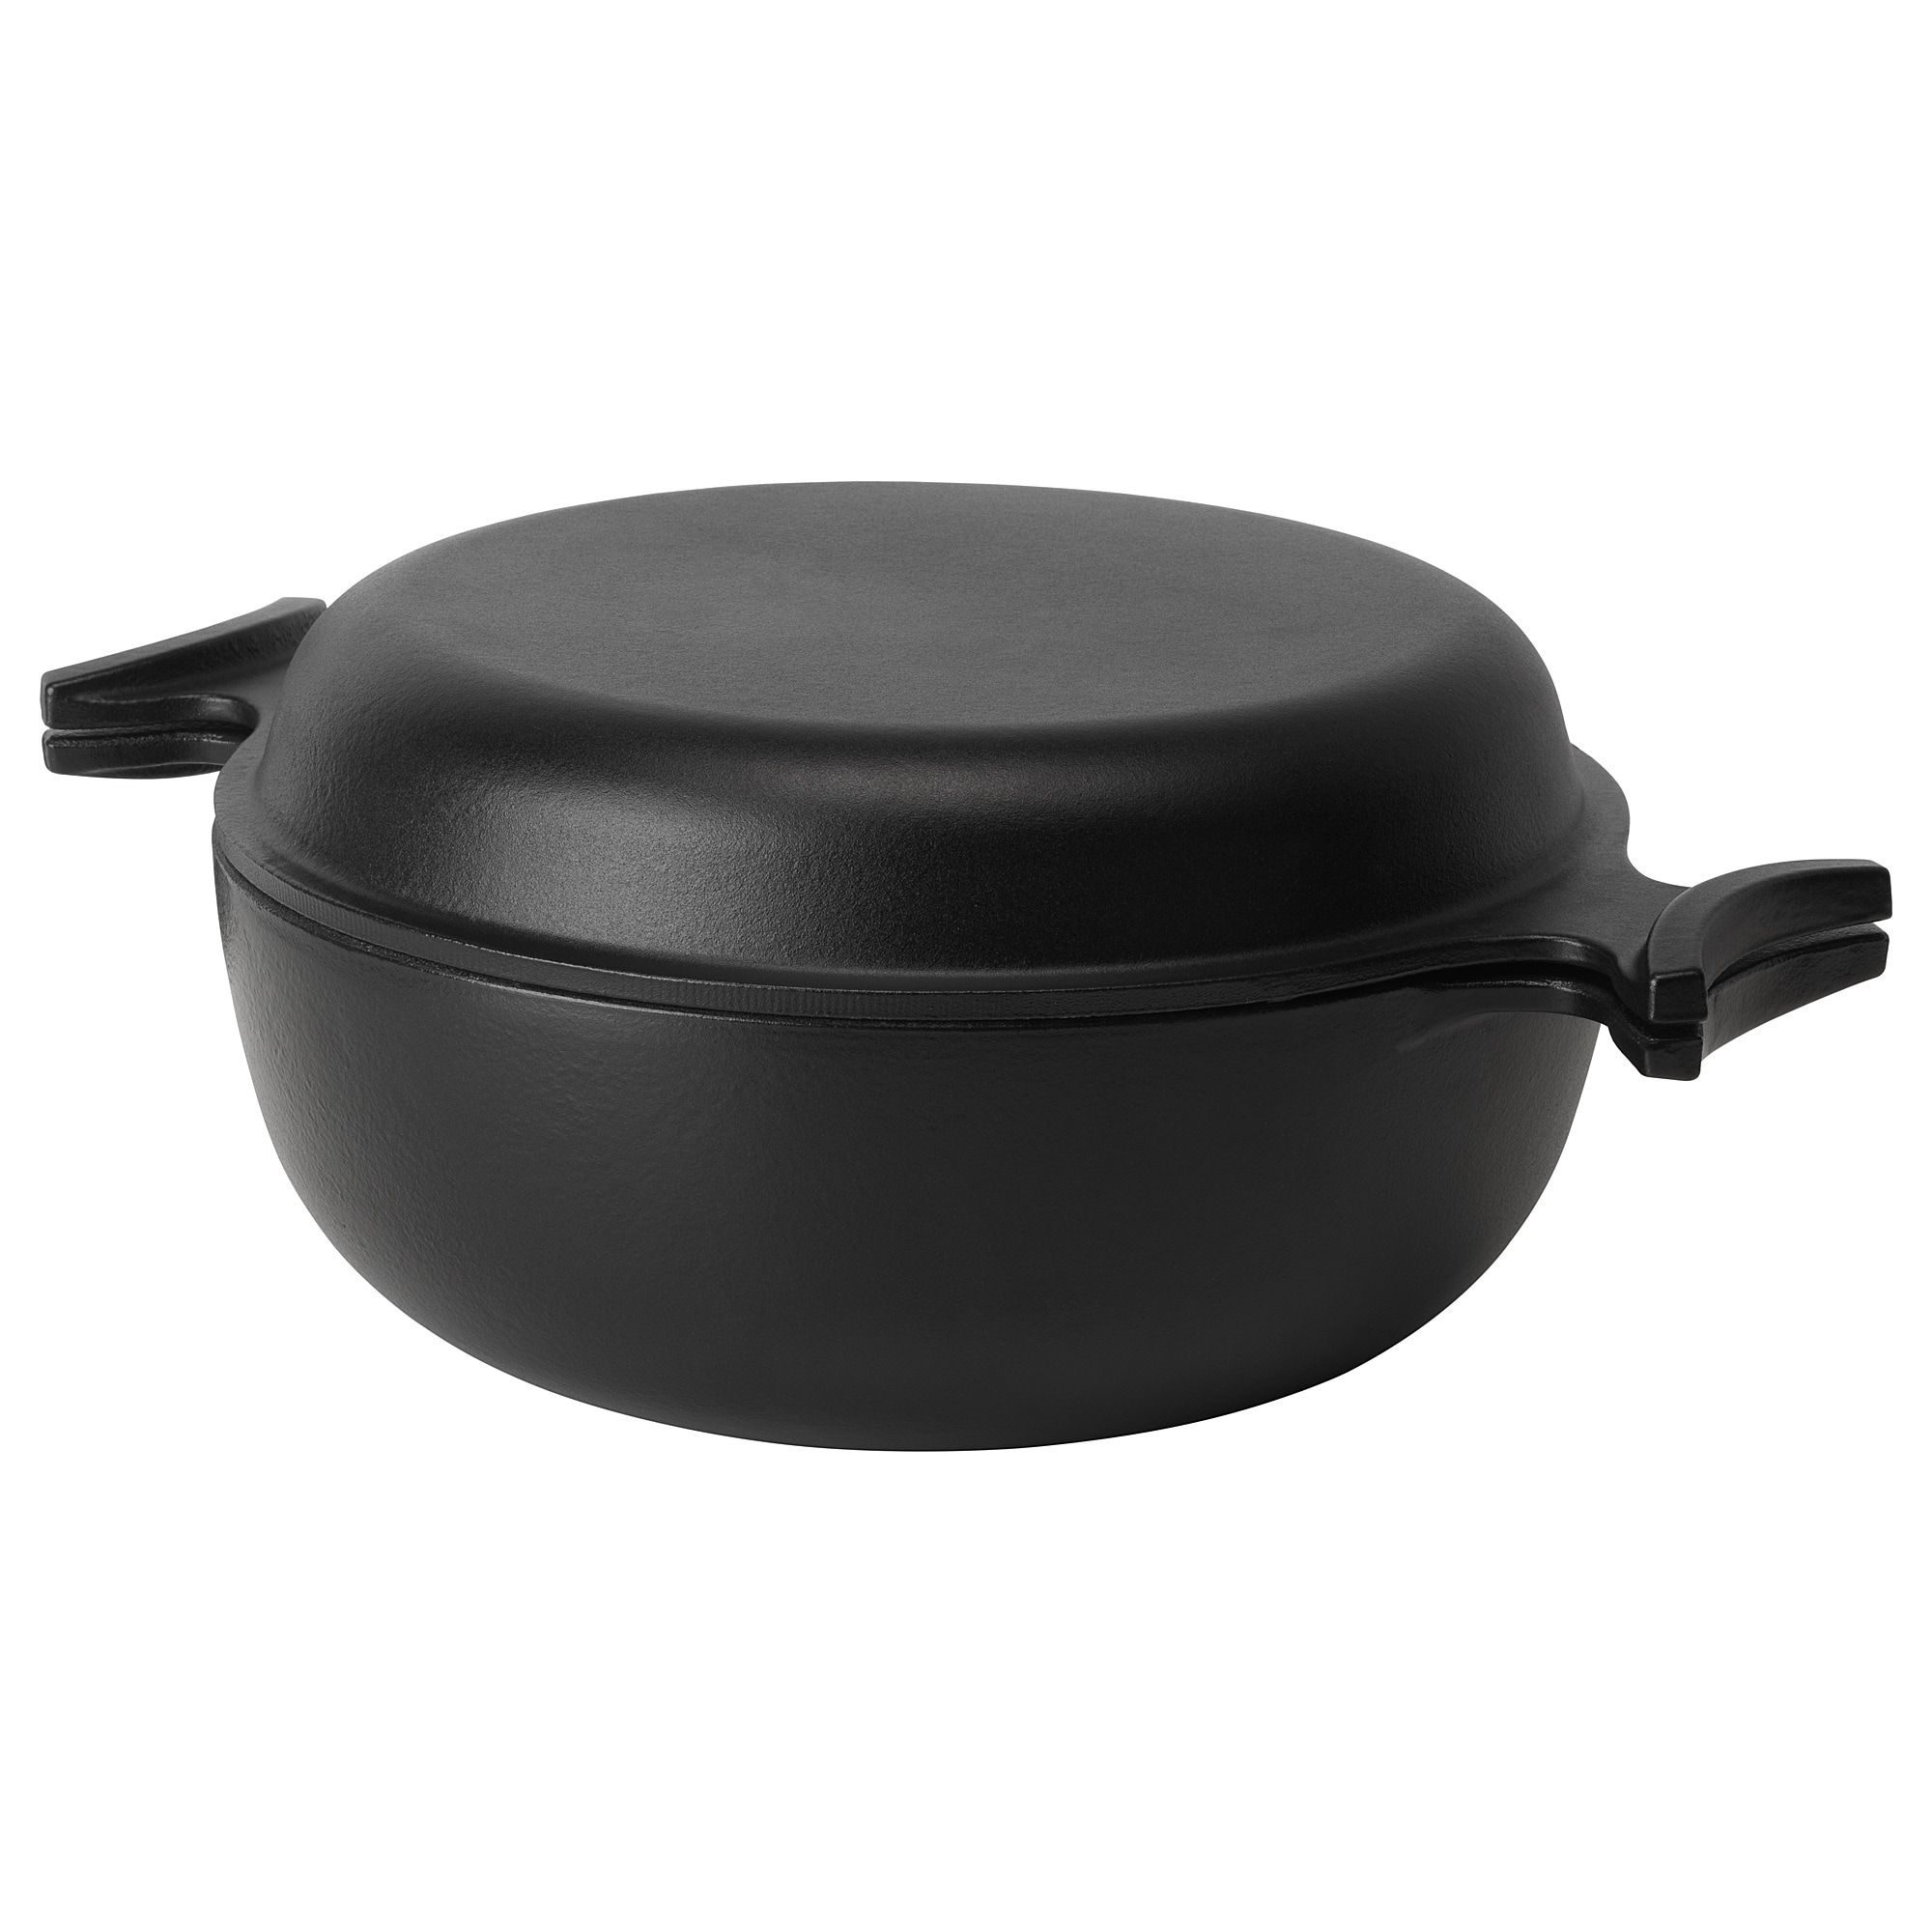 Överallt Pot With Lid Black In 2019 Ikea Gl Cooktop